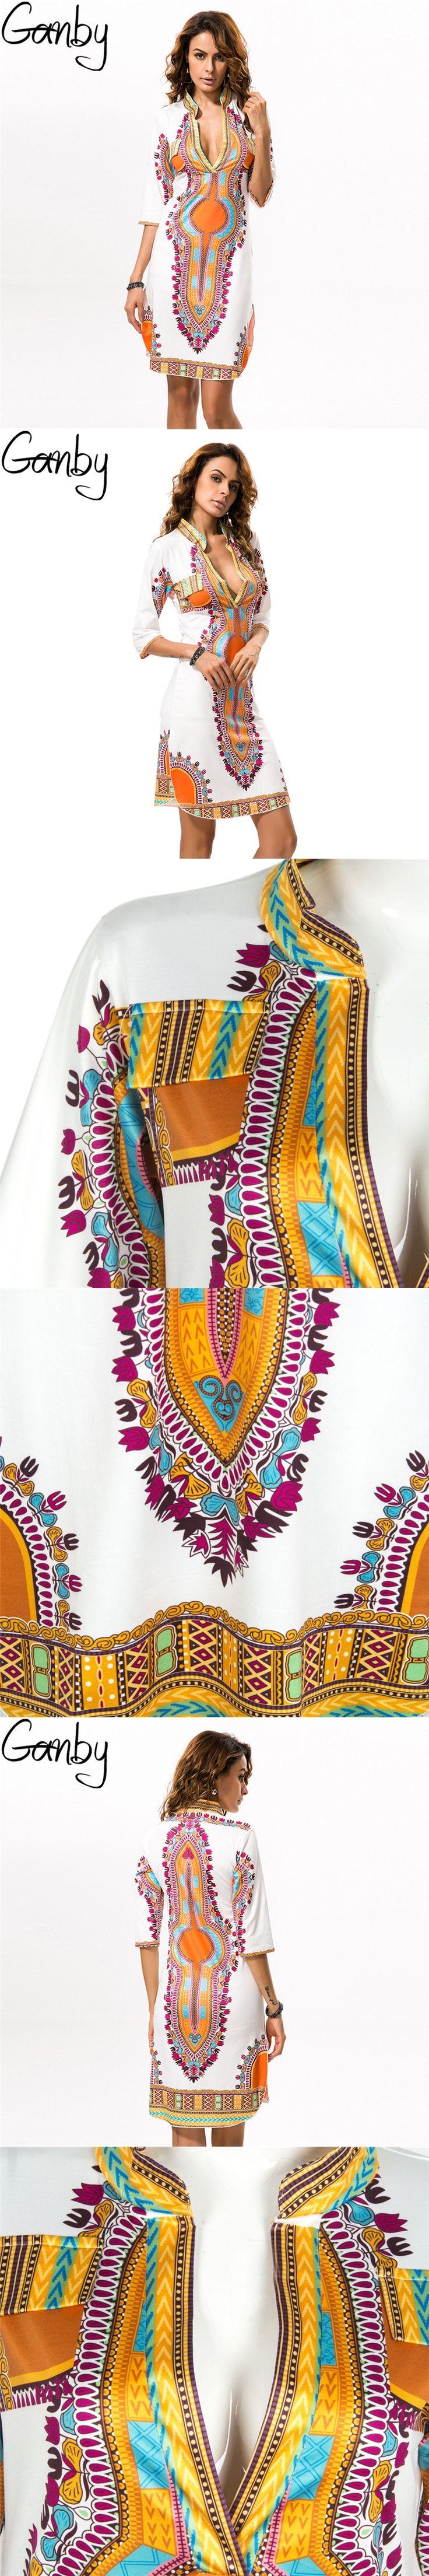 3XL Plus Size Wholesale African Clothes Dashiki Dress for Women Casual Summer Hippie Print Dashiki Fabric Femme Boho Robe Femme